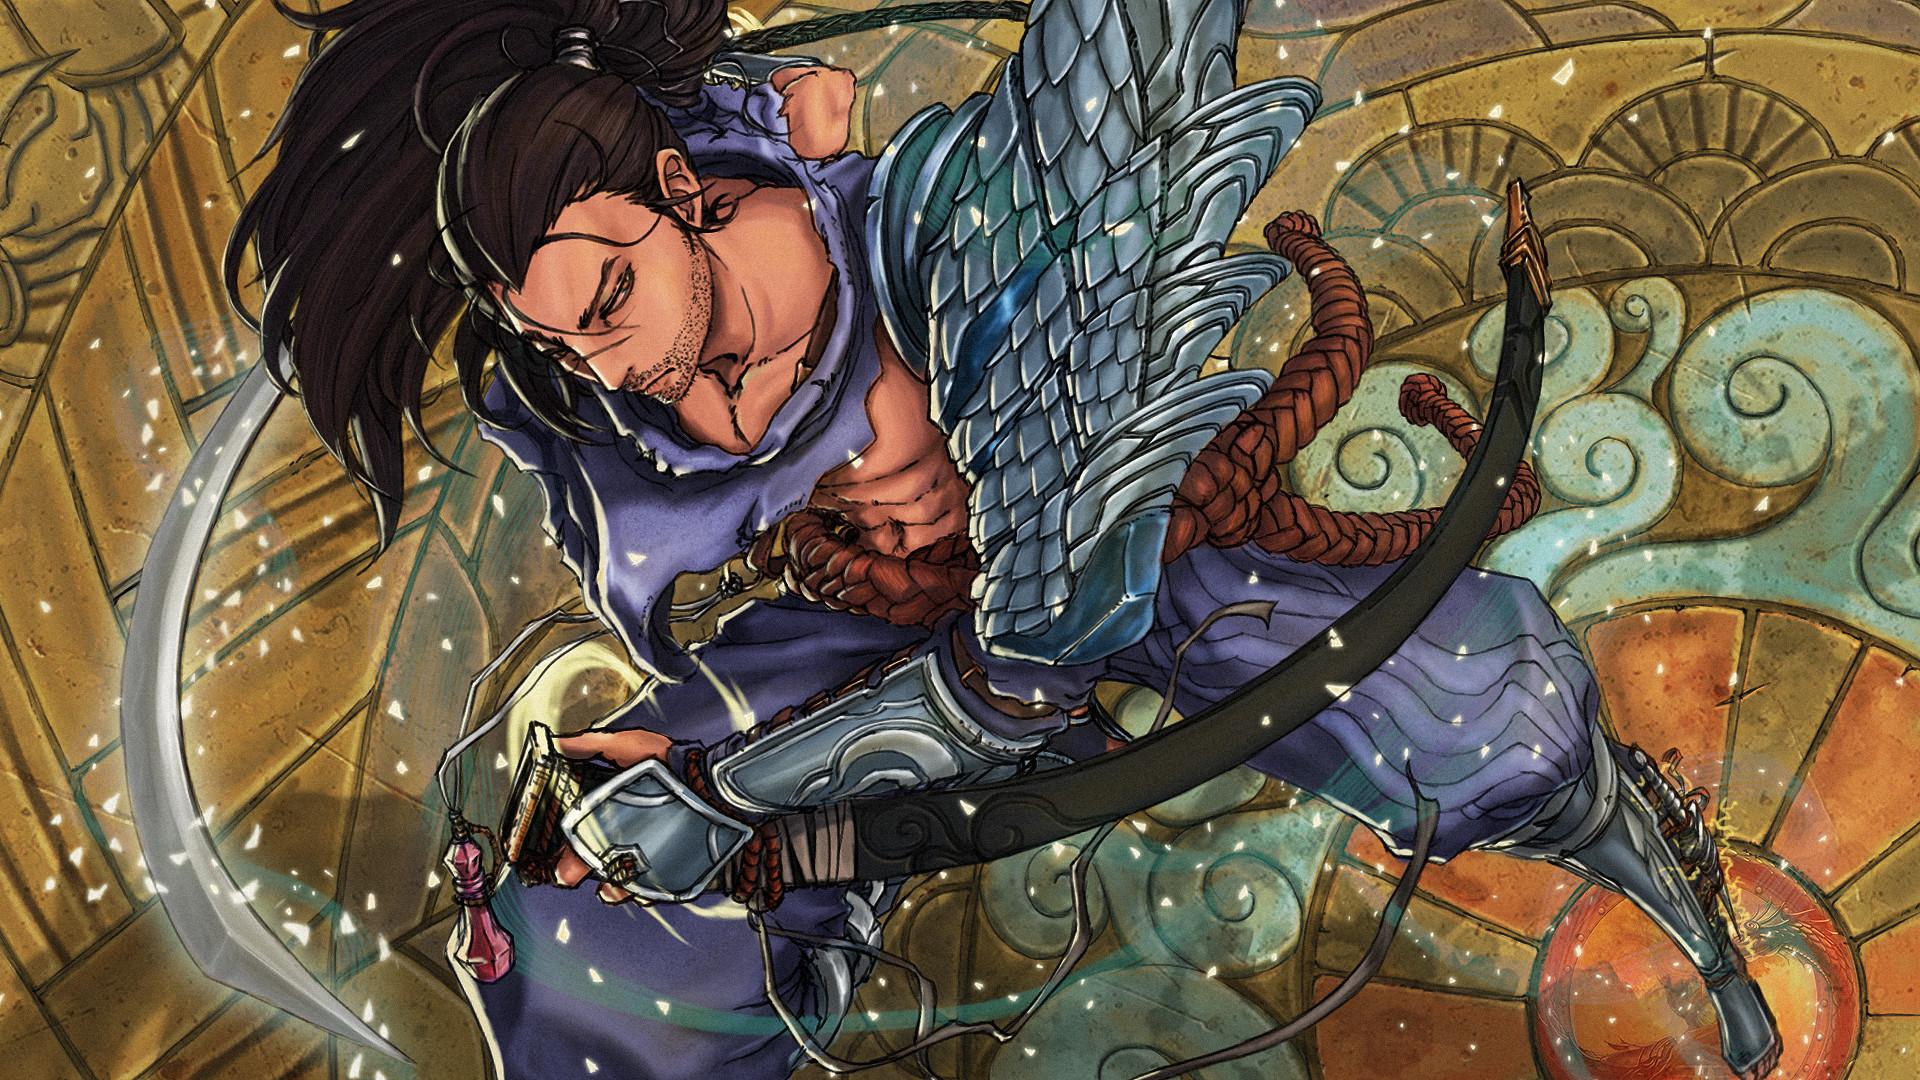 Tags: Anime, Kumagzter, League of Legends, Yasuo (League of Legends)